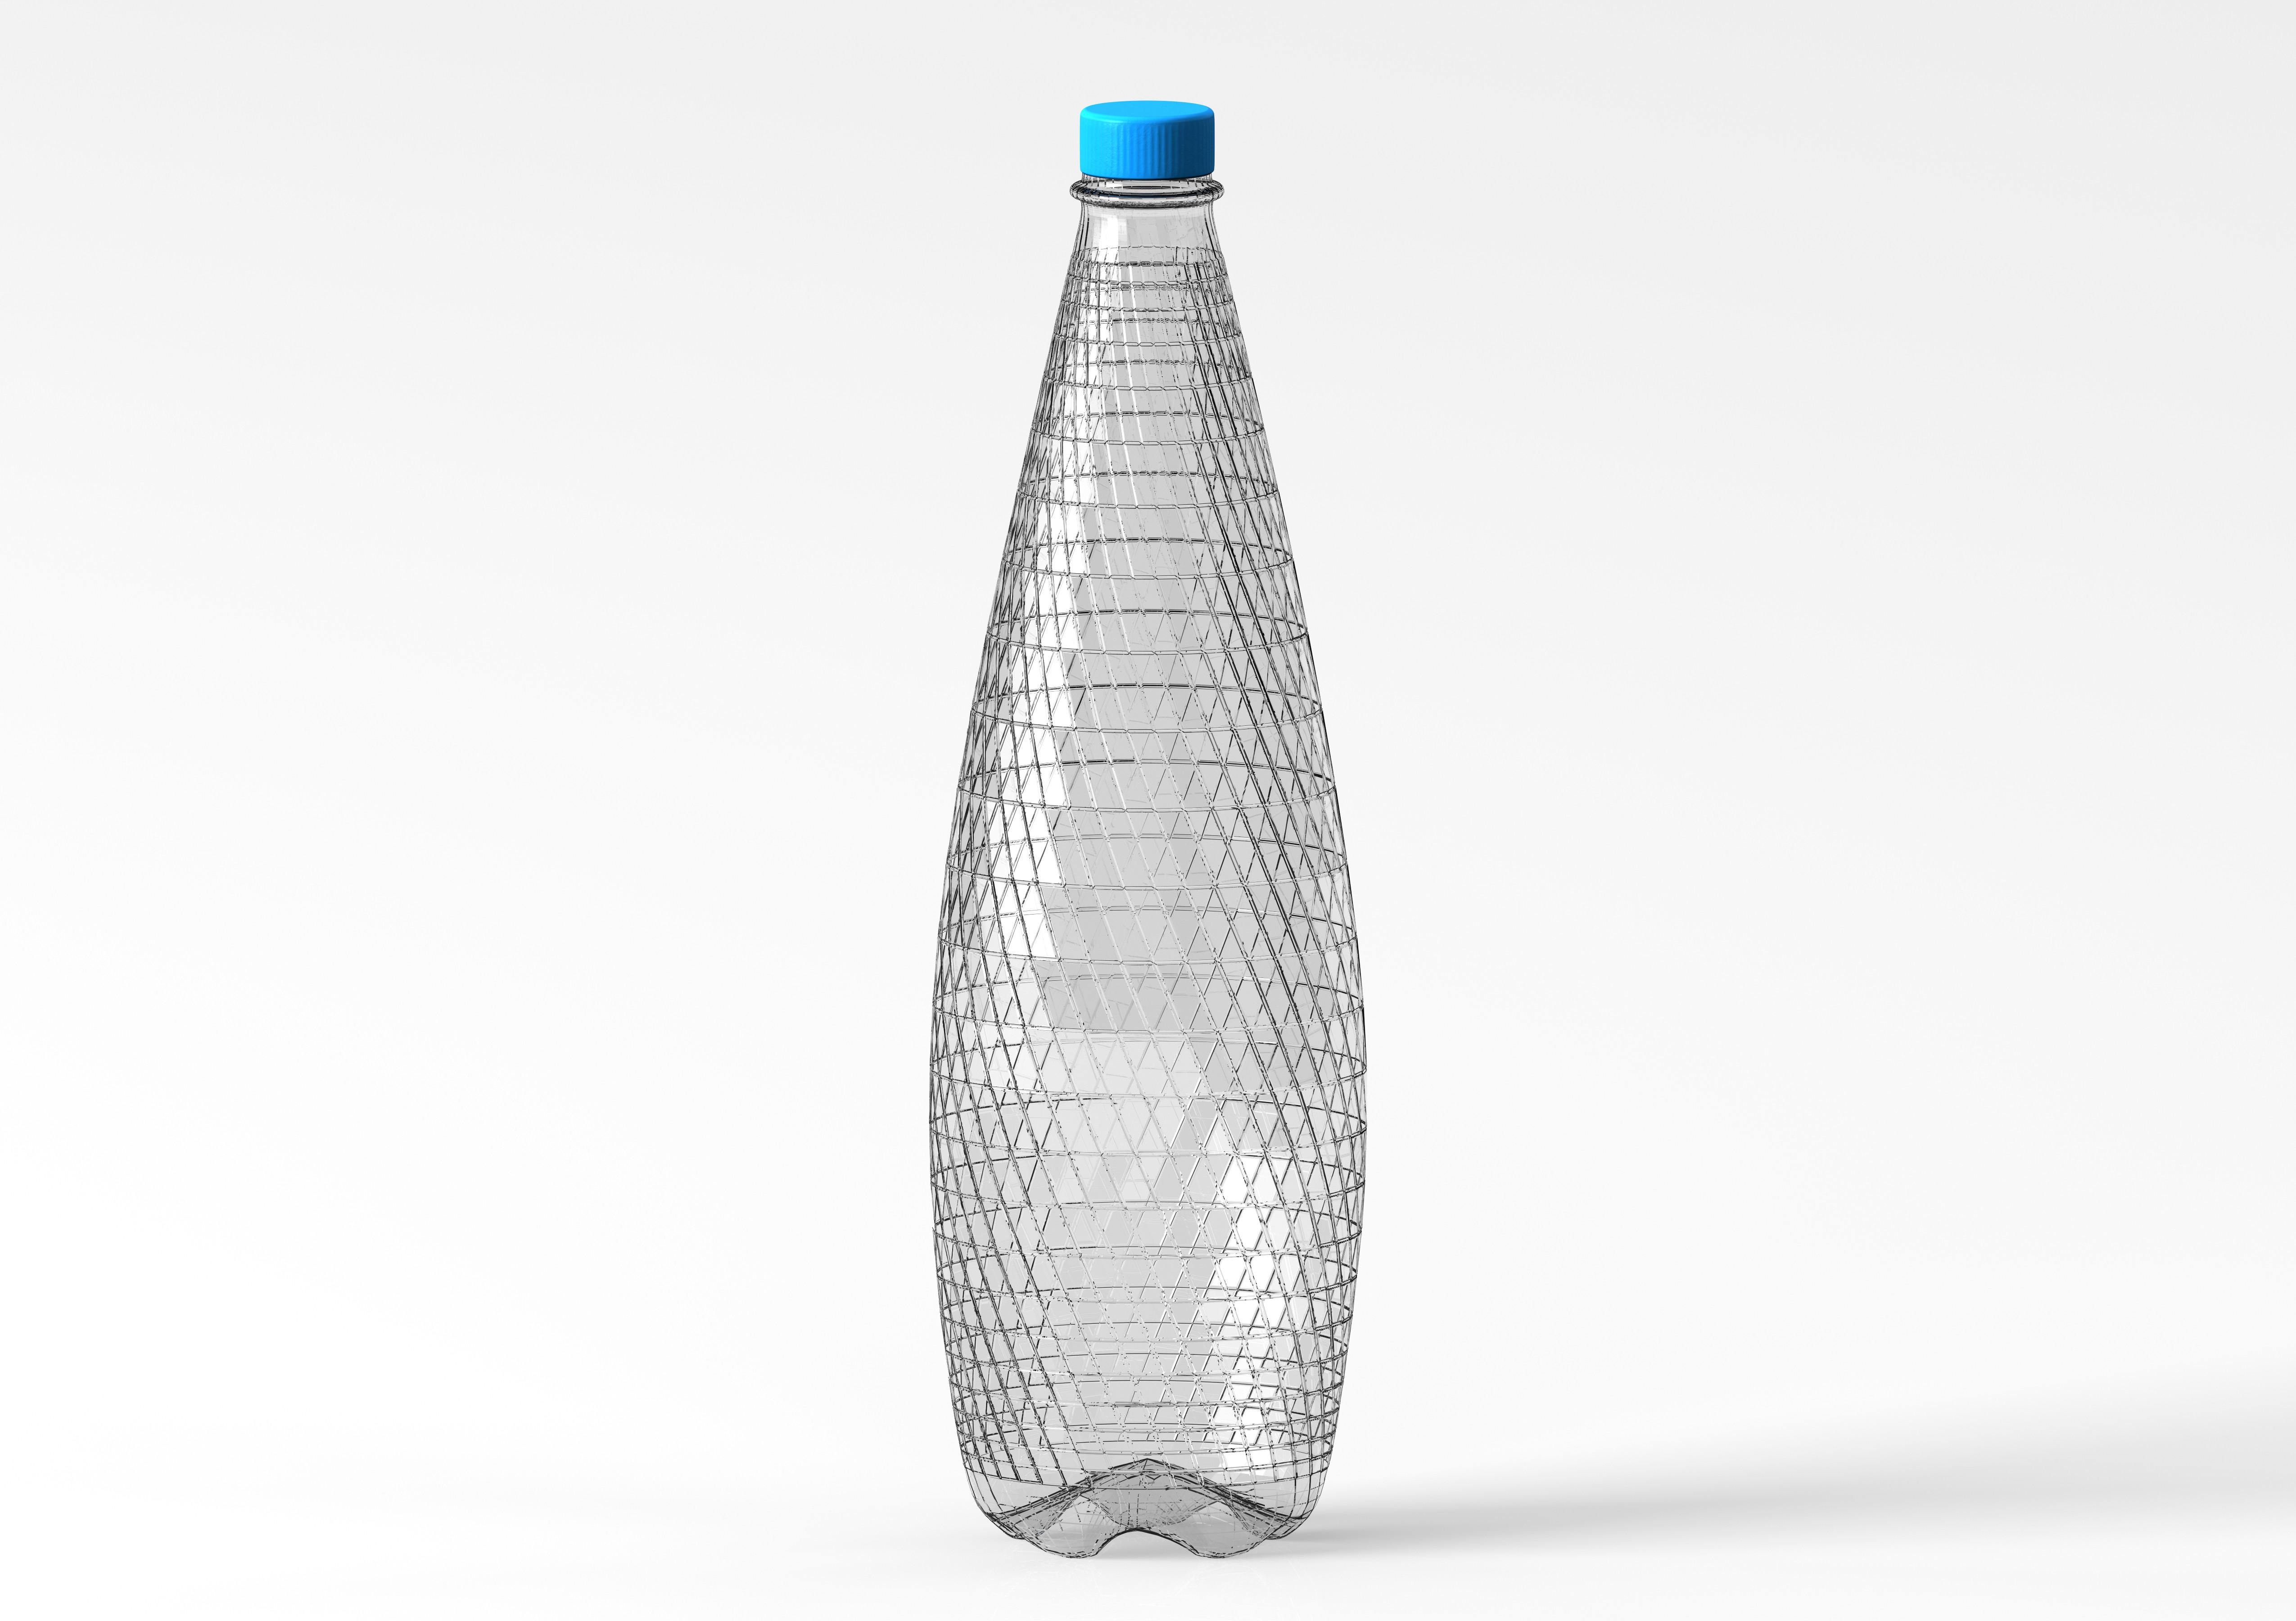 plastic bottle vase design of bottle design bottle design creator intended for images of bottle design creator